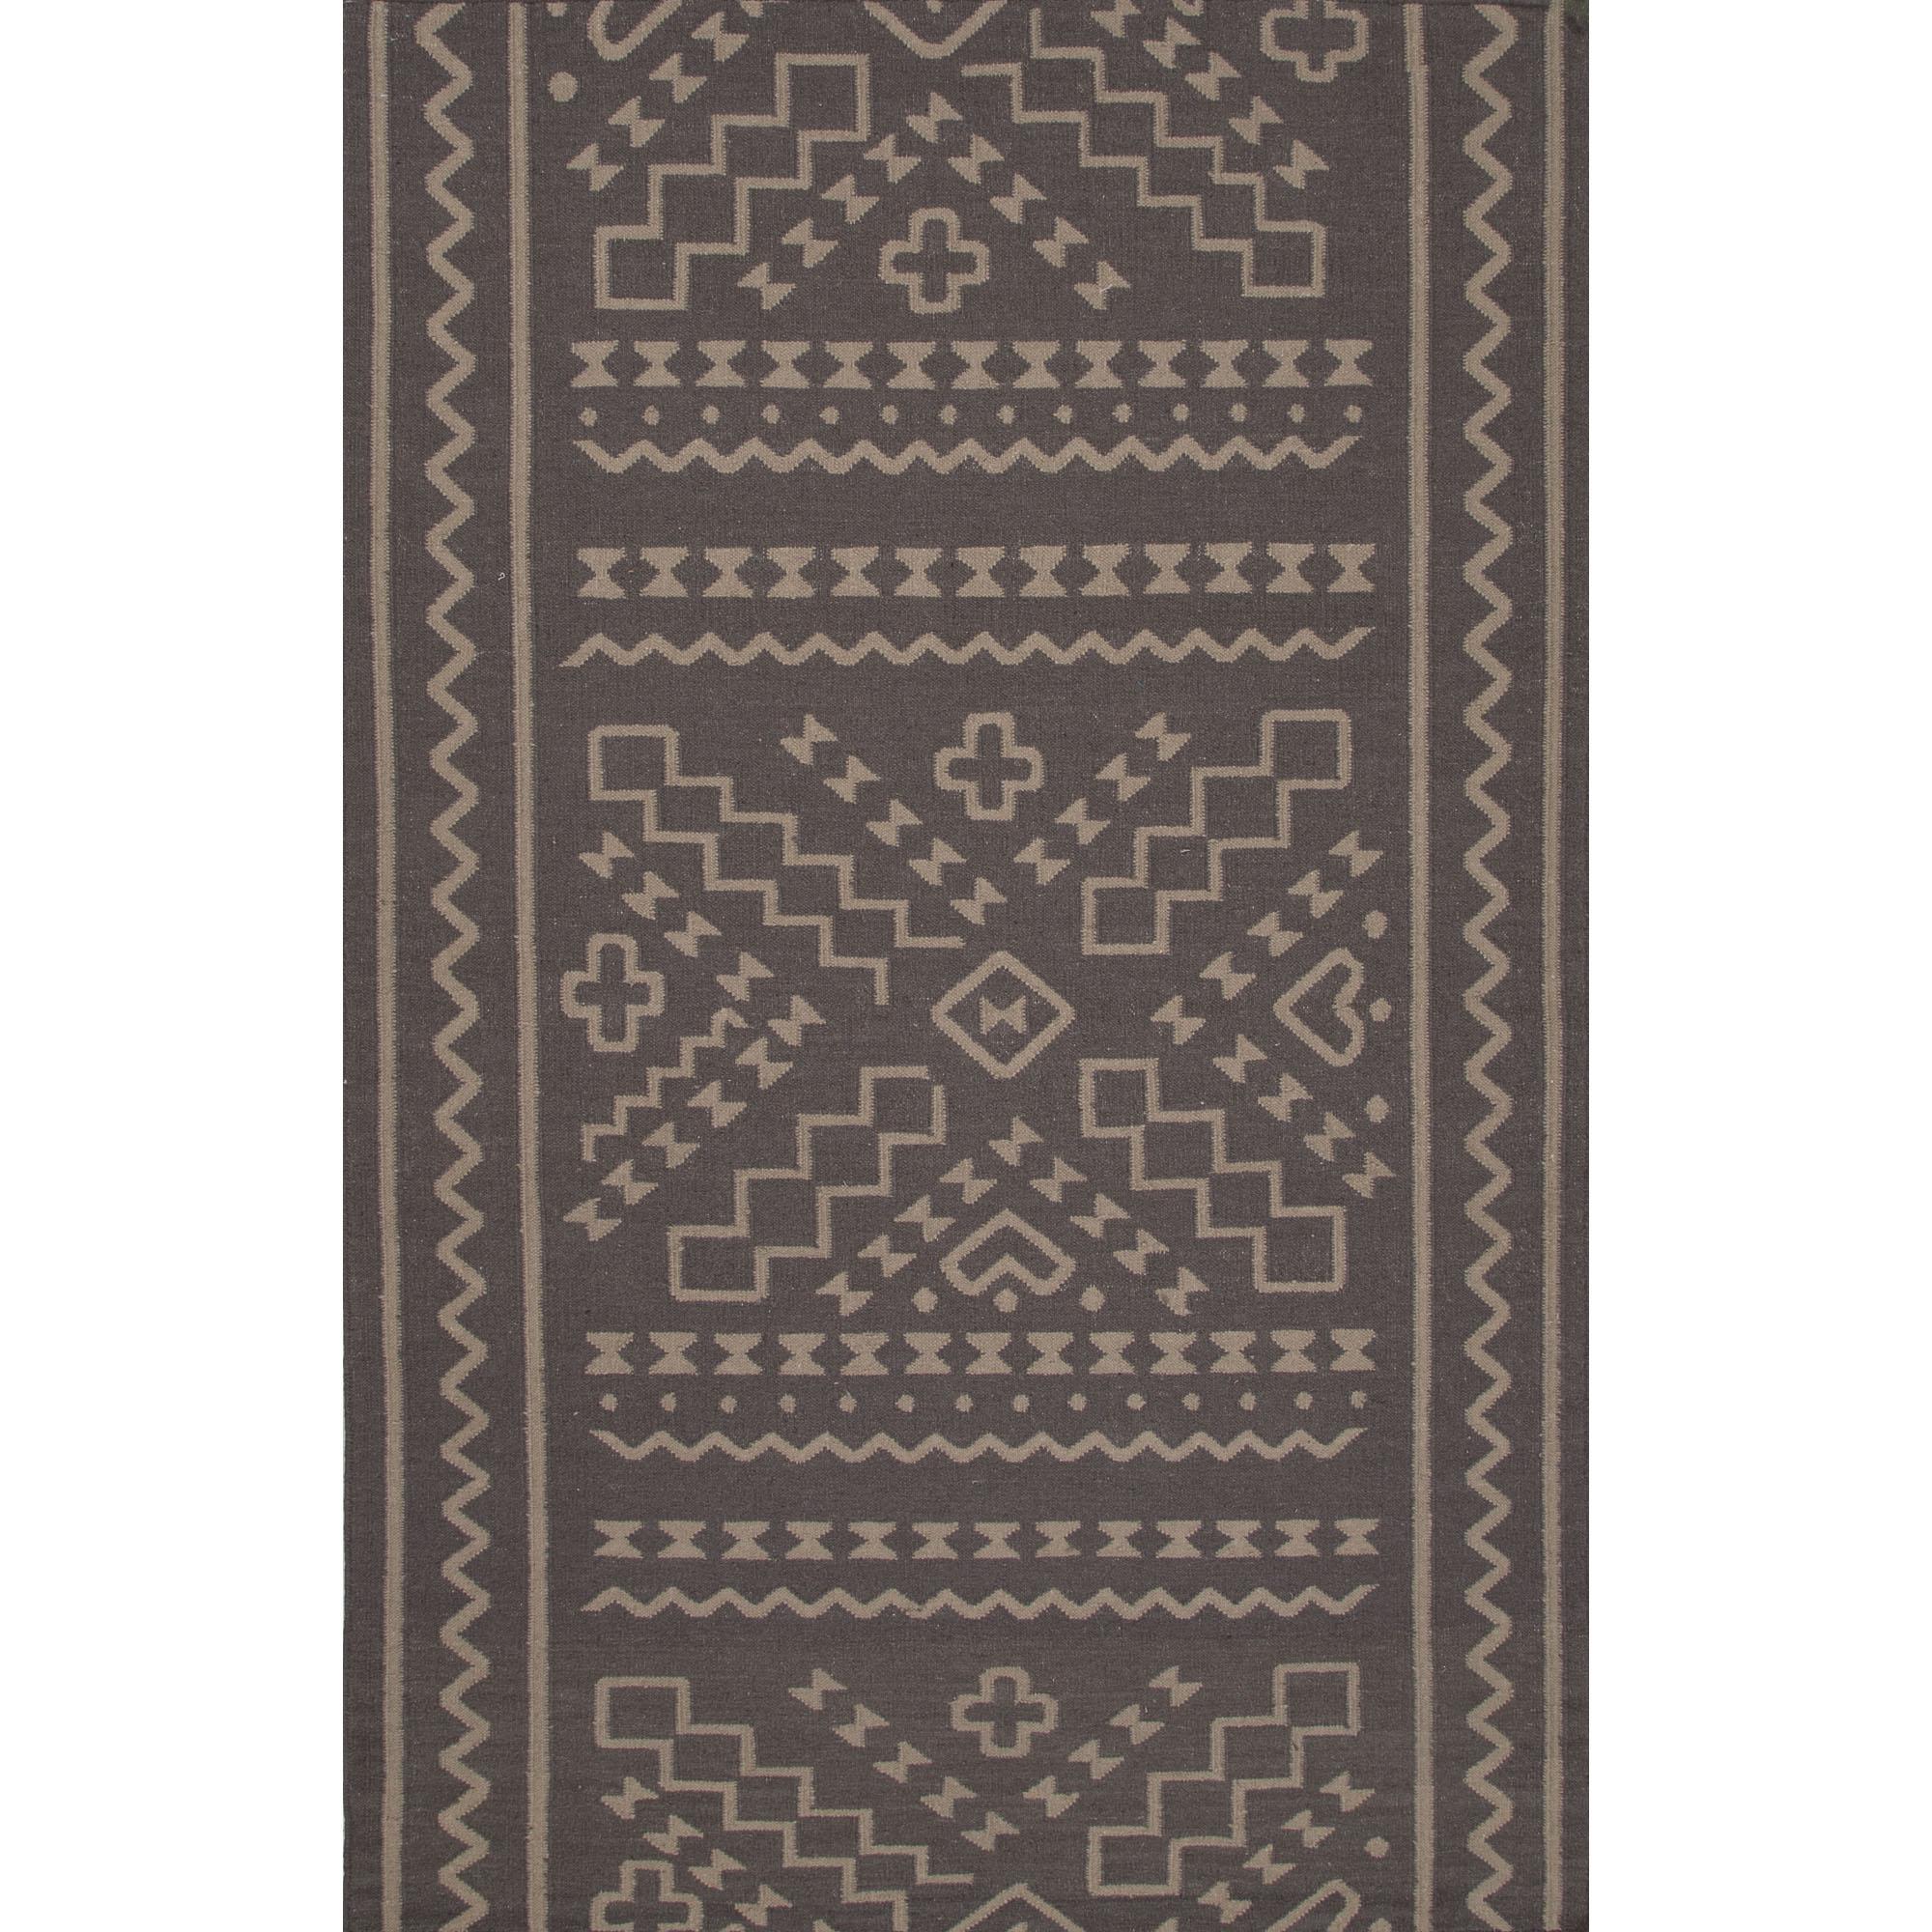 JAIPUR Rugs Traditions Modern Flat Weave 5 x 8 Rug - Item Number: RUG119862